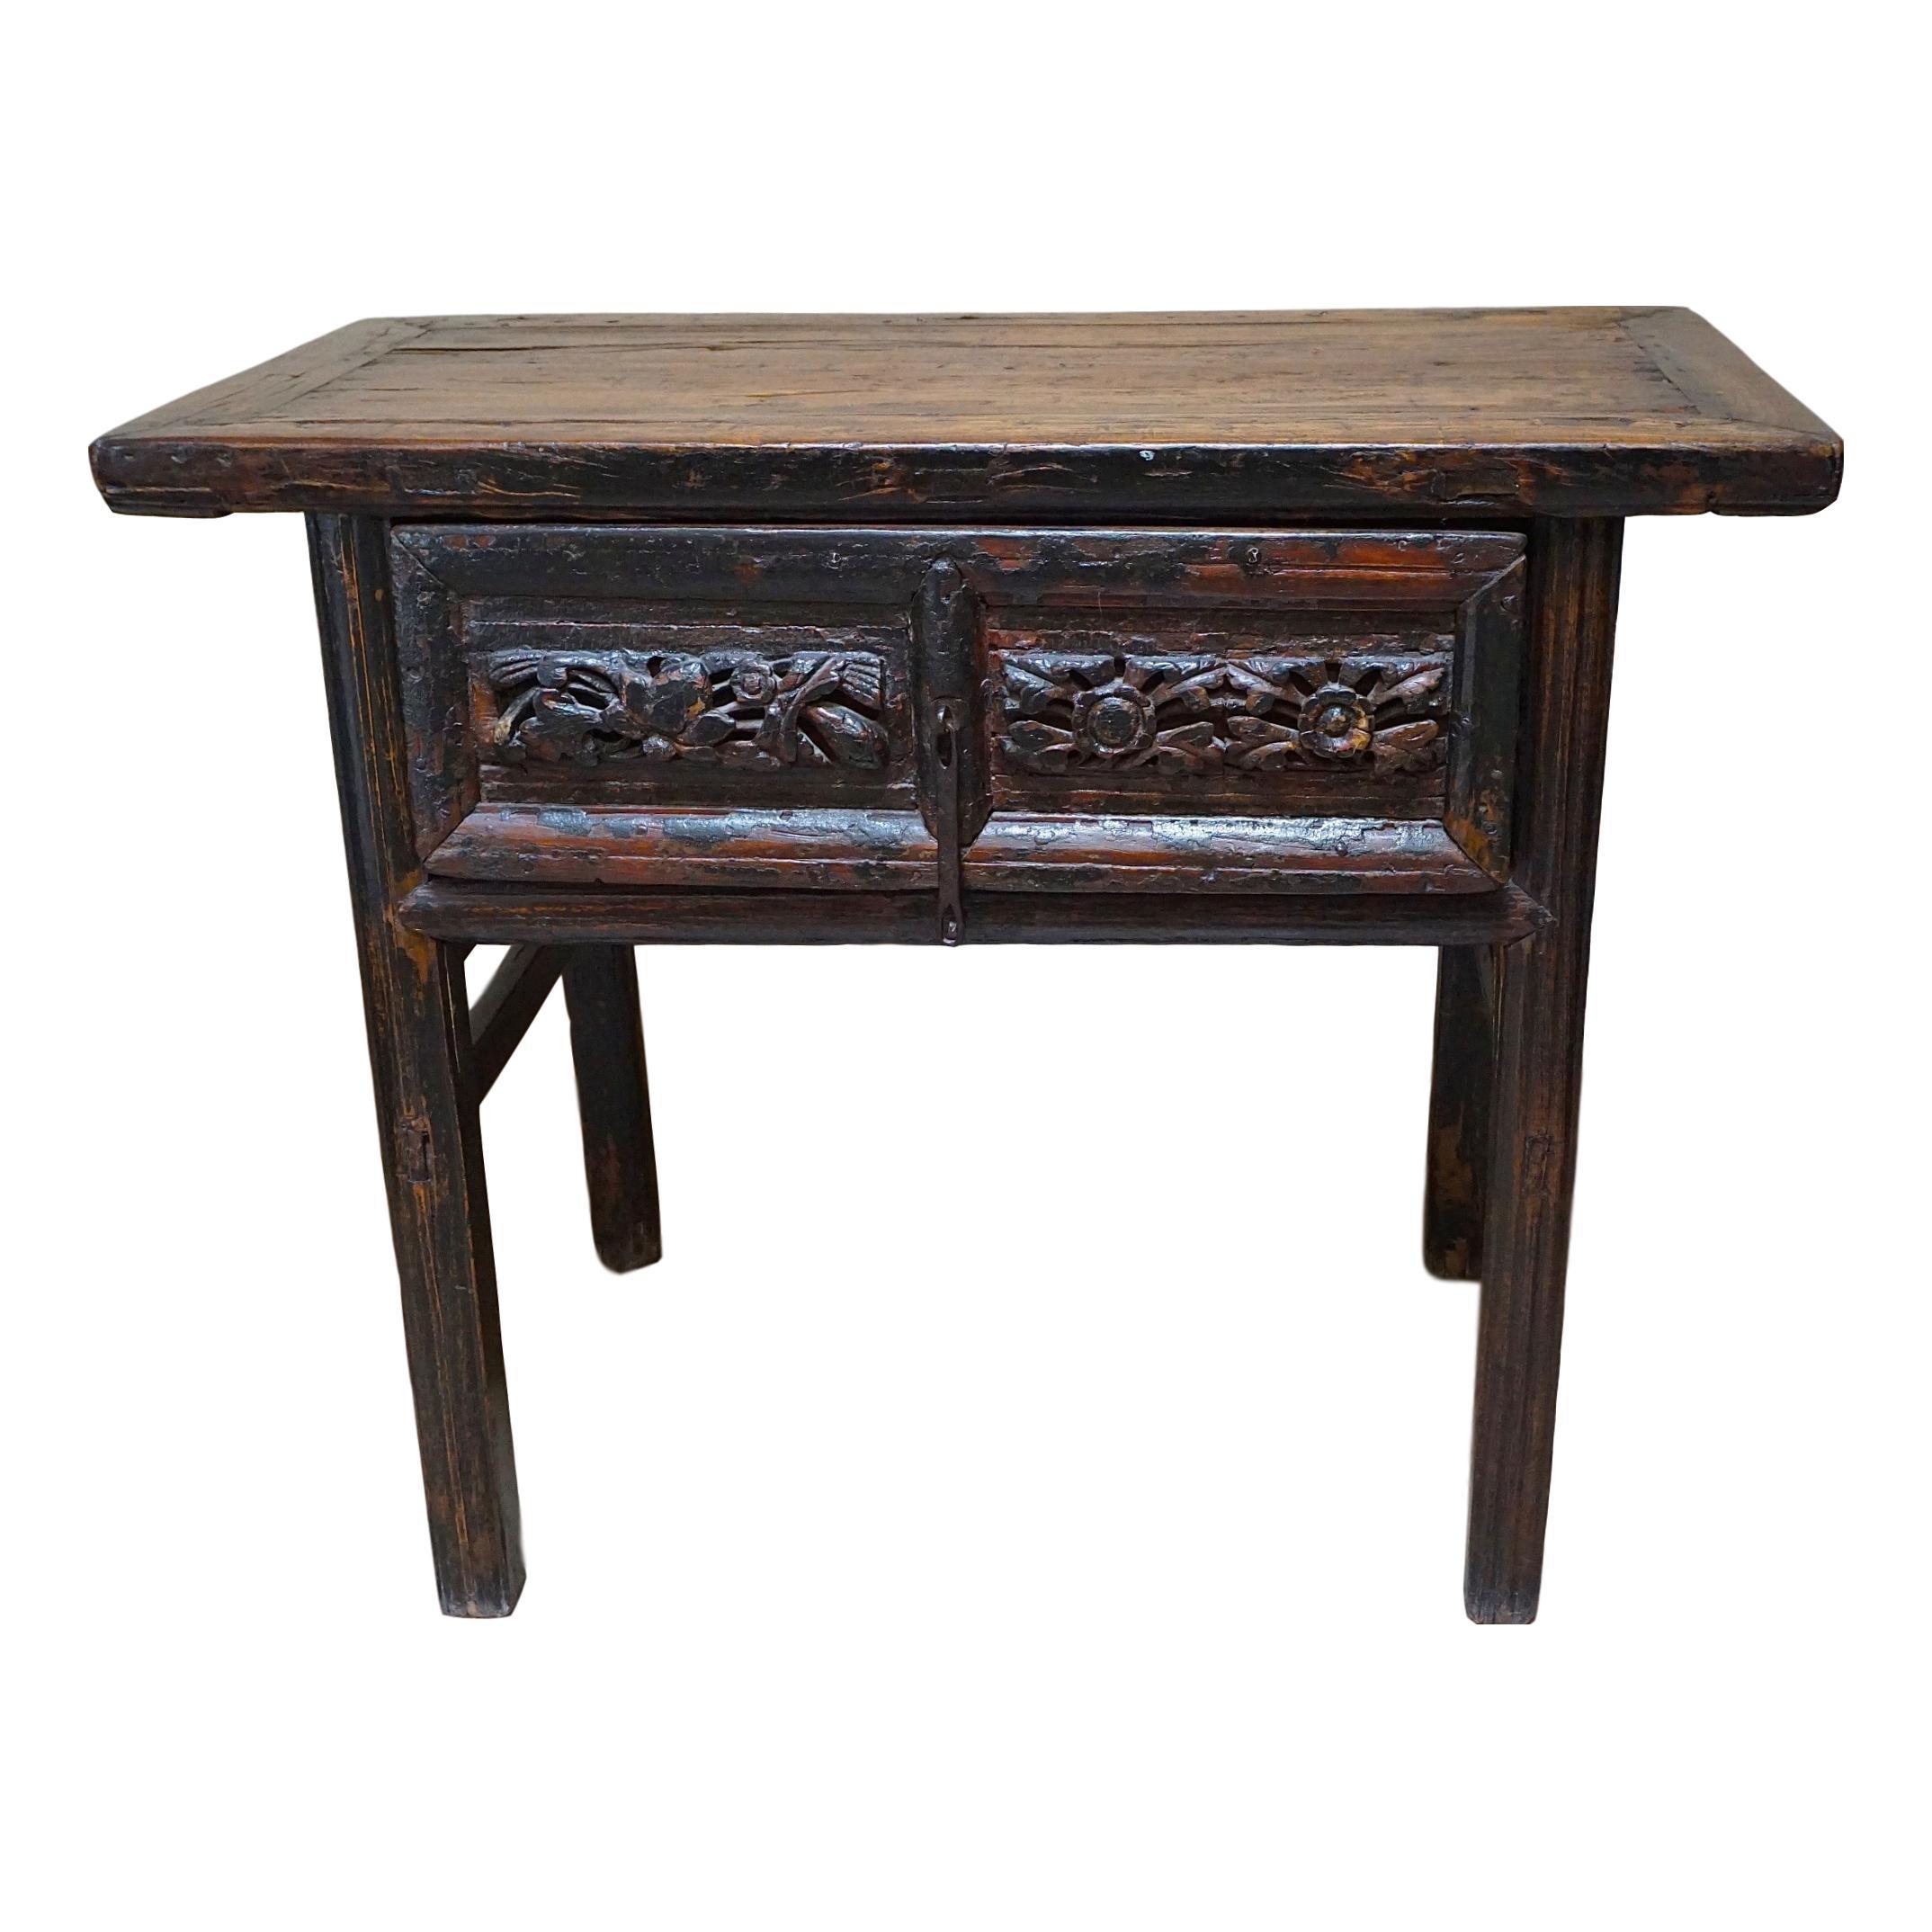 Primitive Painted Antique Asian Console Table Chairish